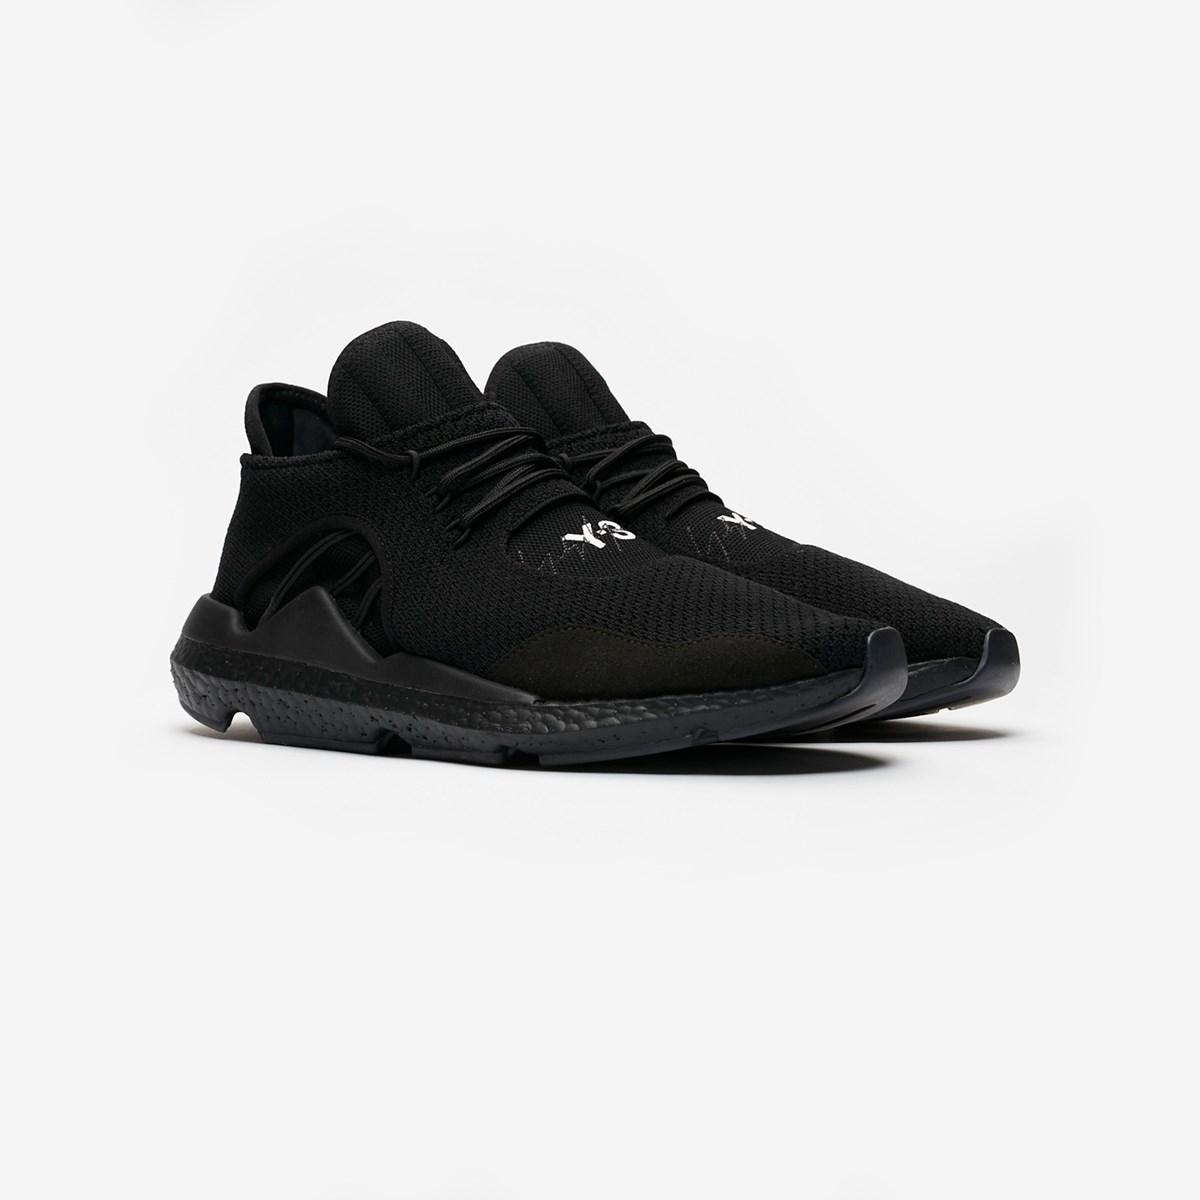 0636e878e90ca adidas Y-3 Saikou - Bc0950 - Sneakersnstuff